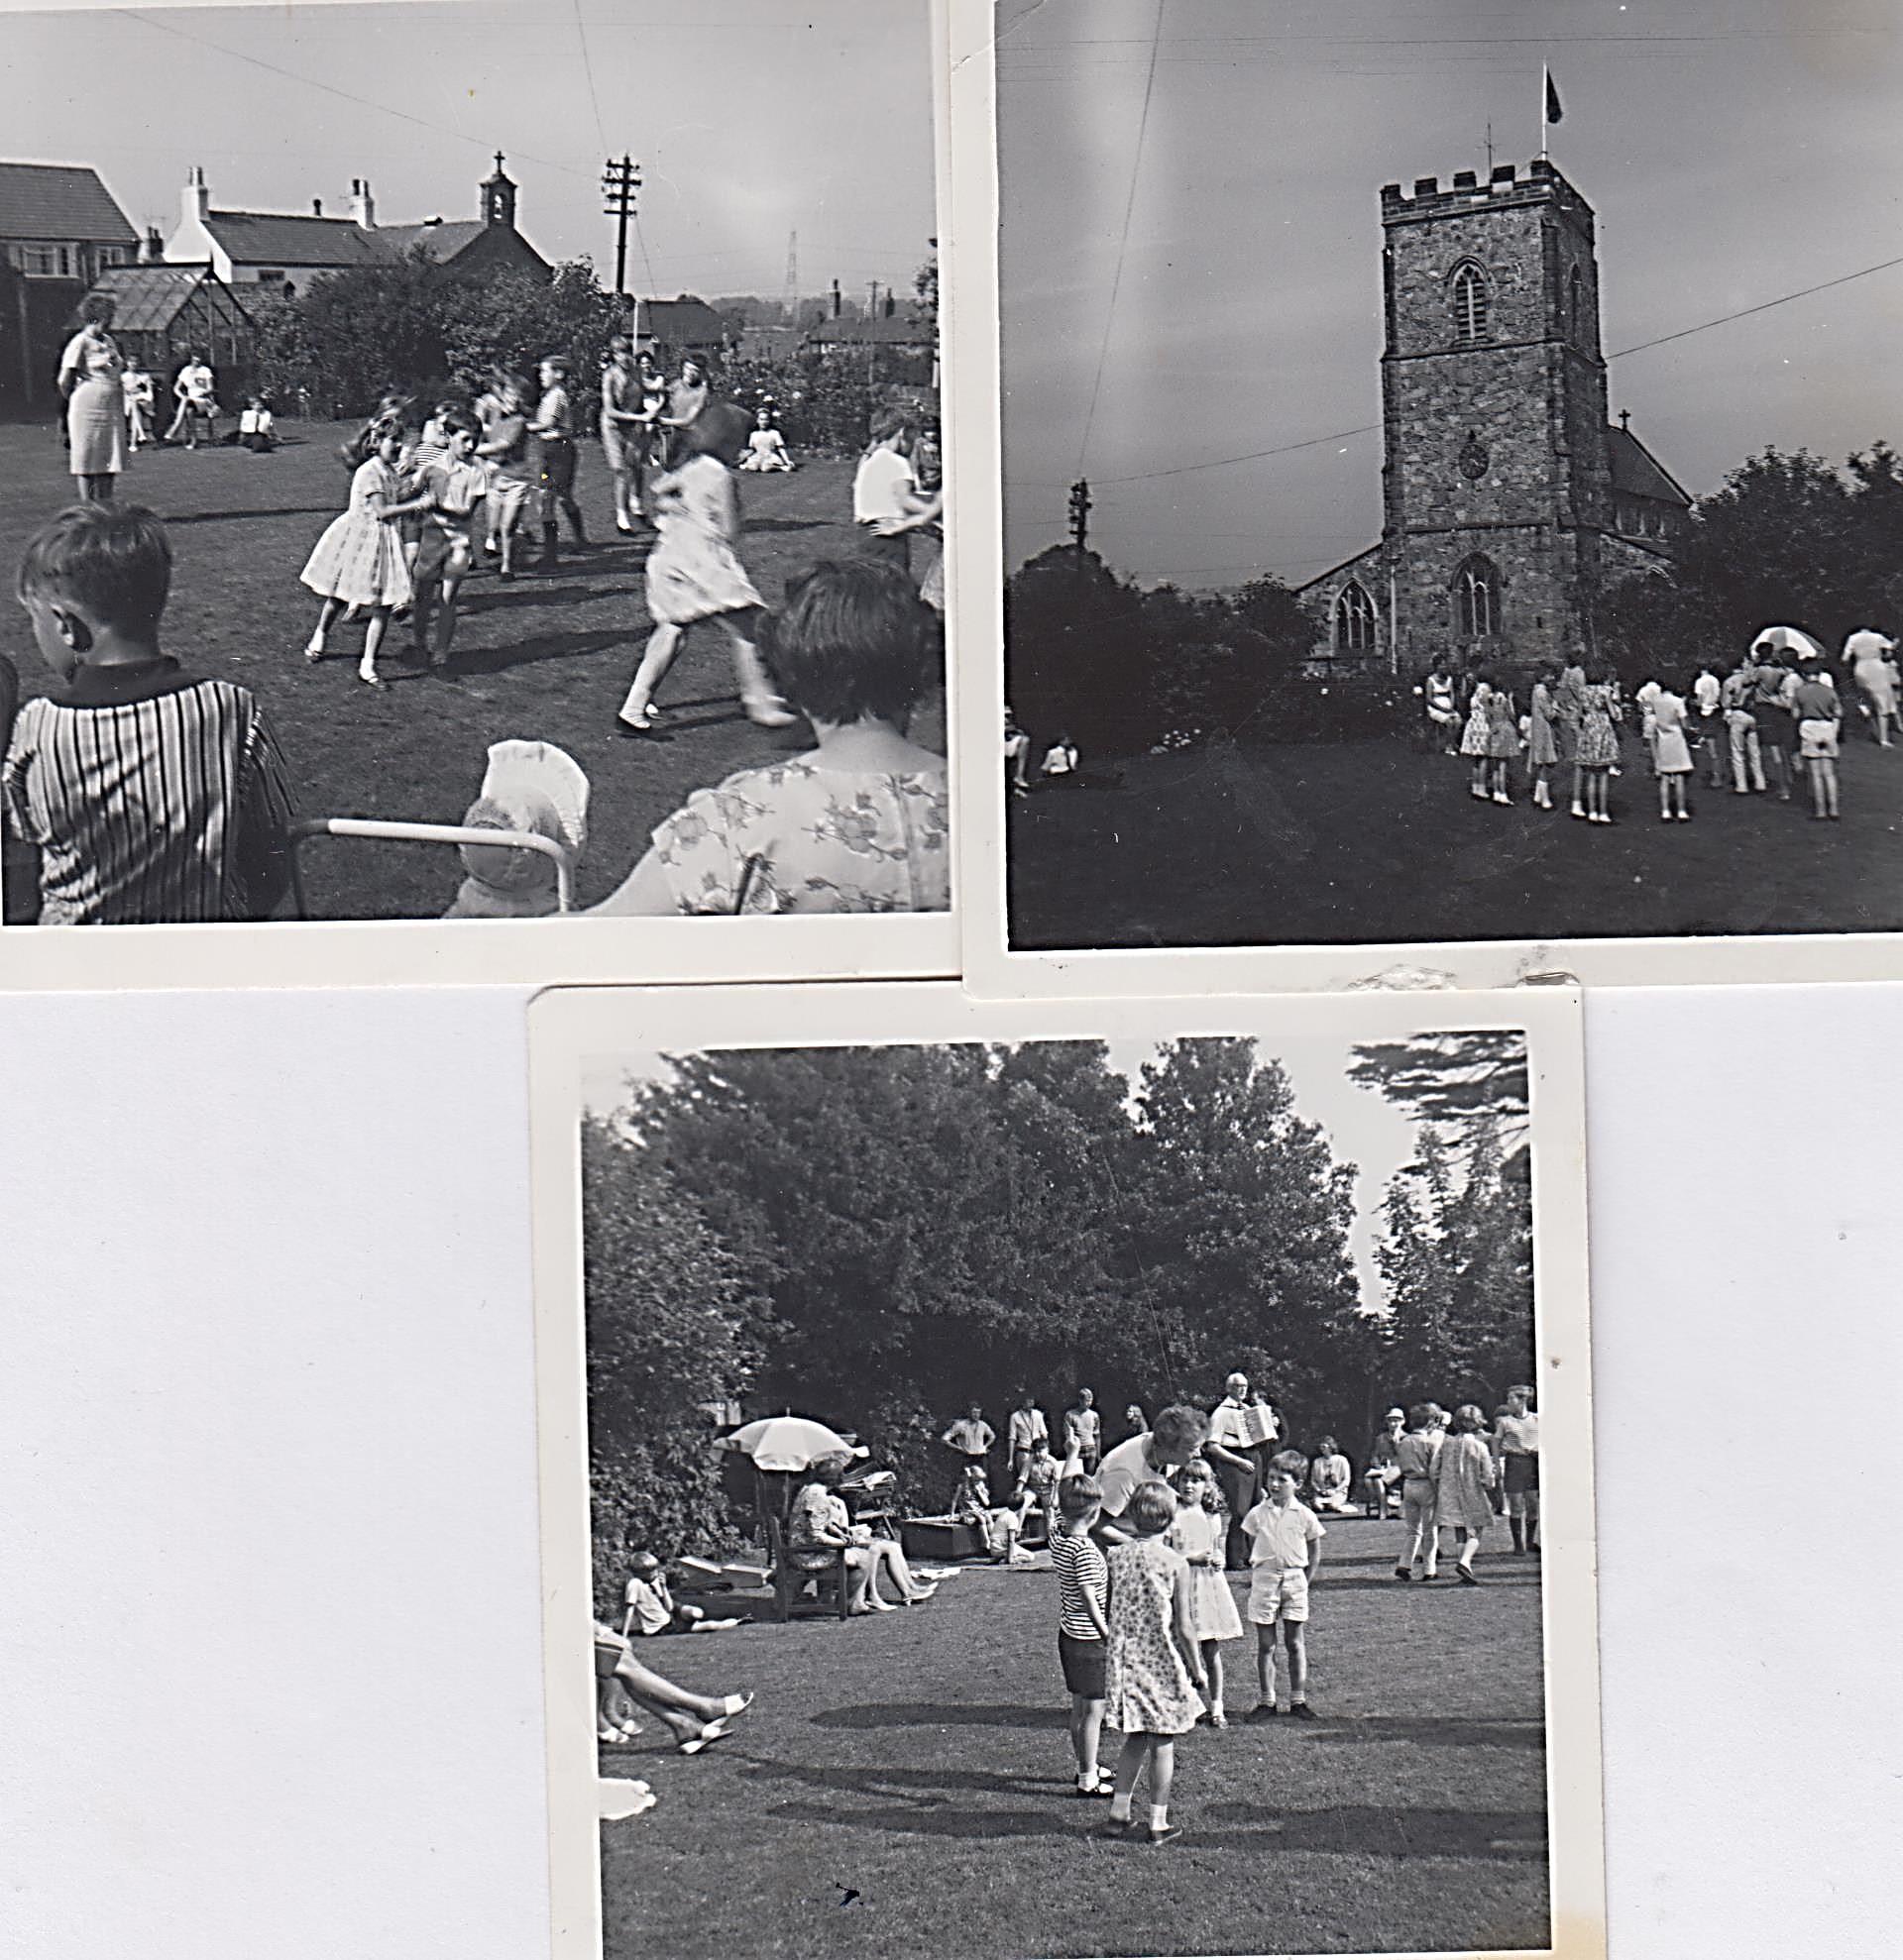 church_garden_party_july_1_1969_001.jpg